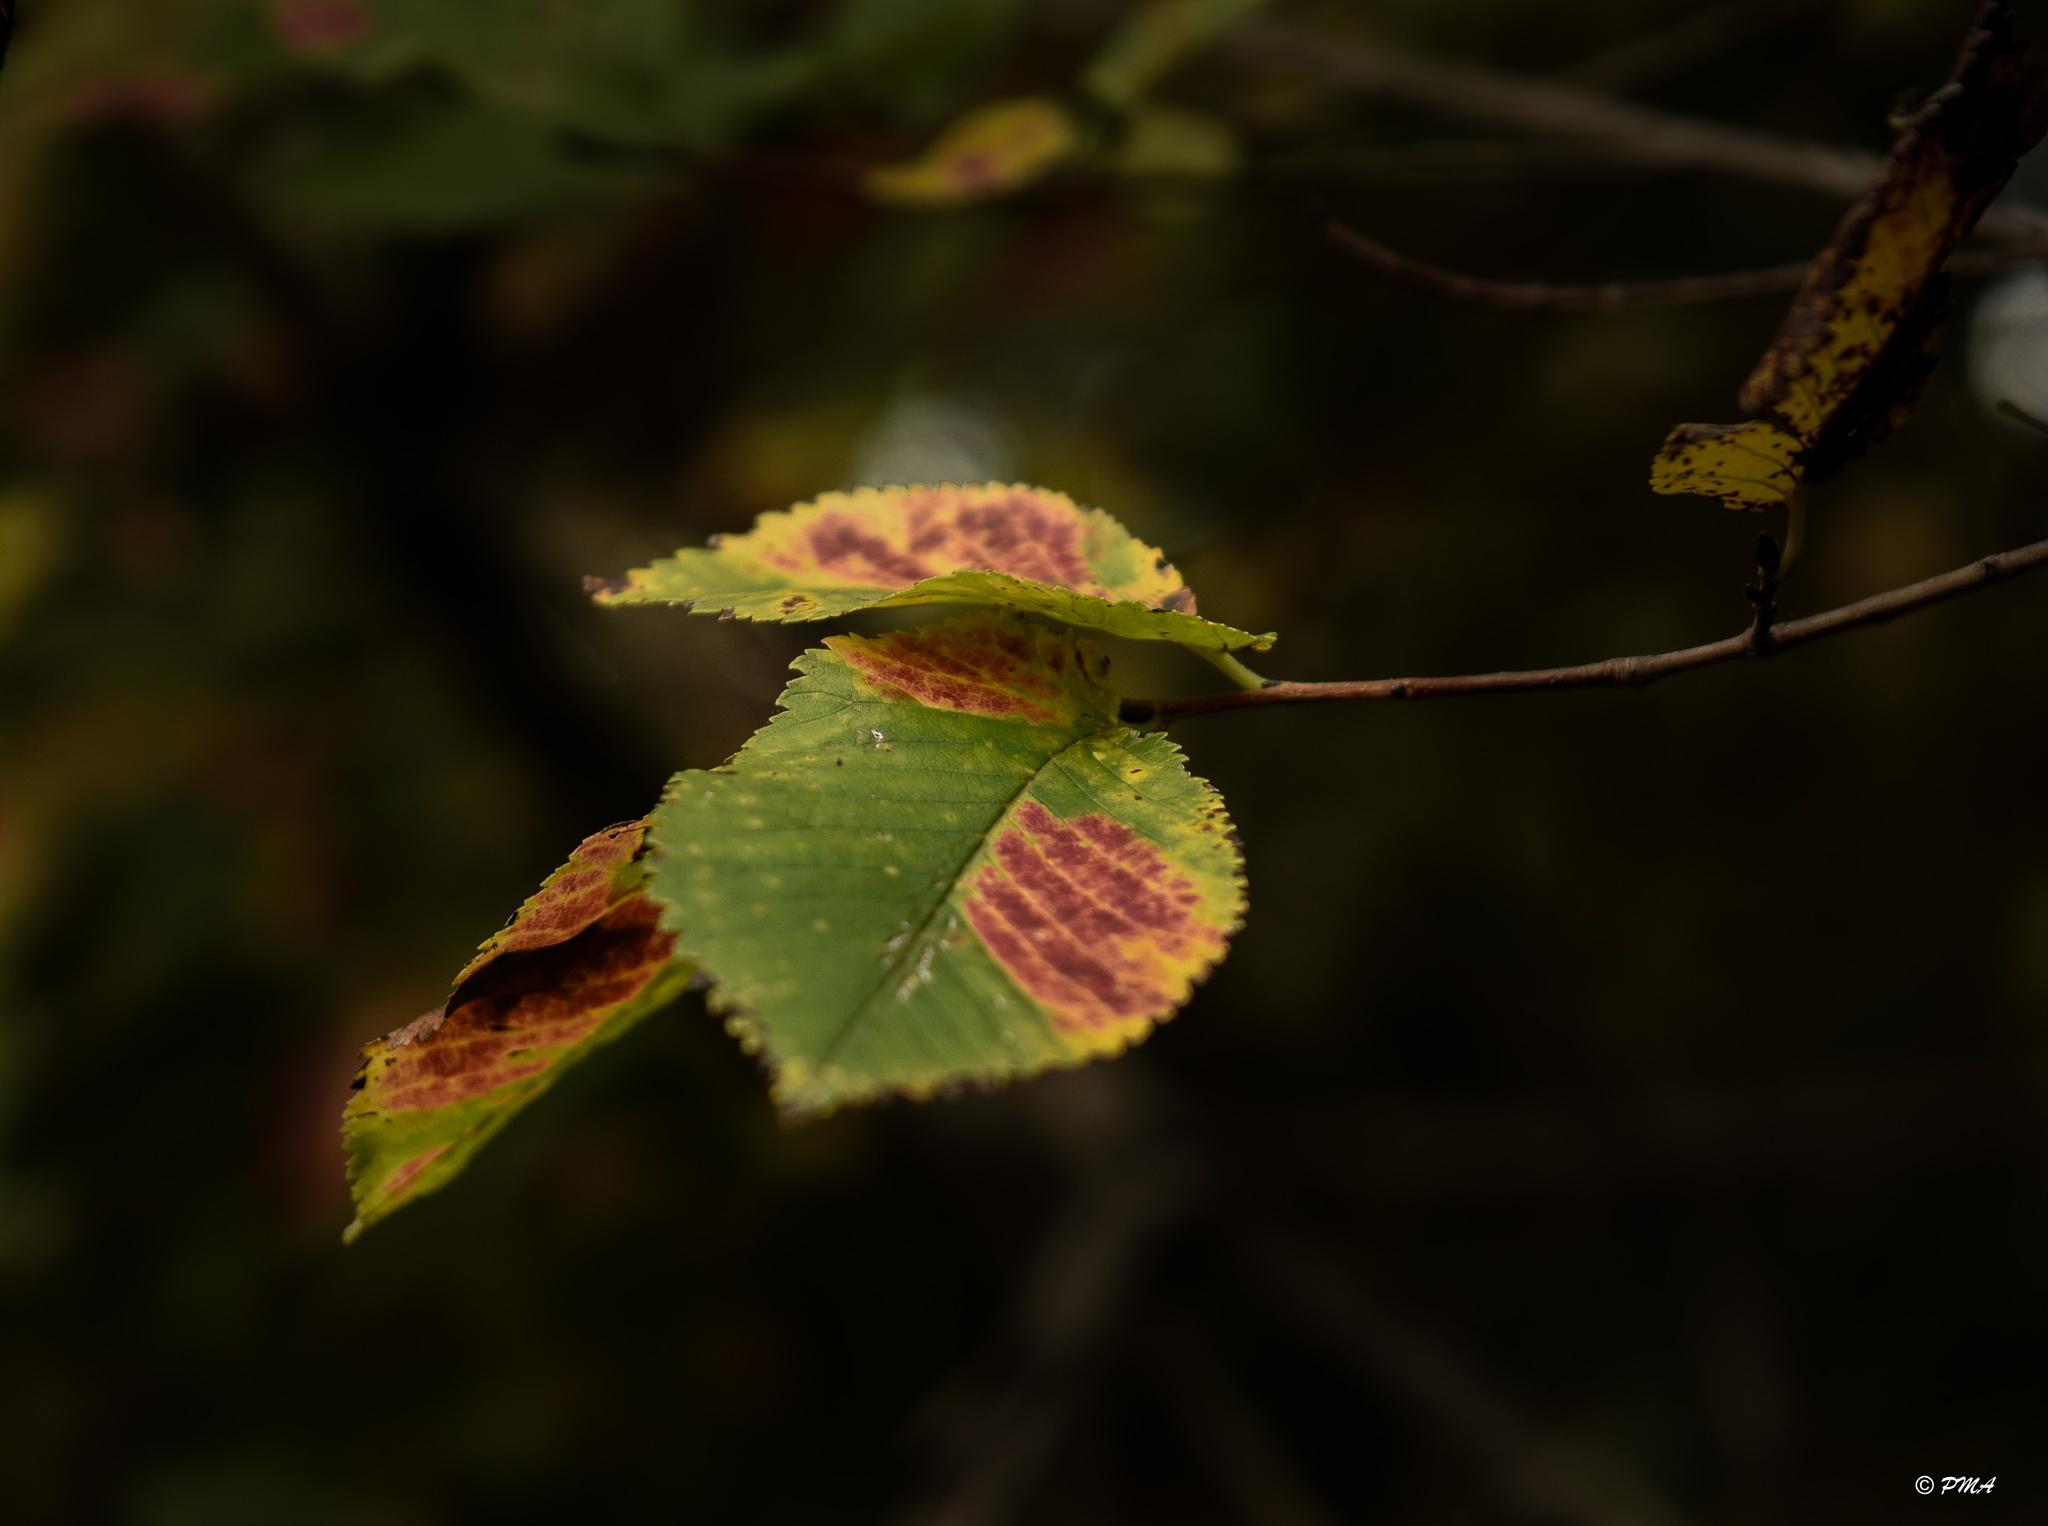 autunno by paomas61